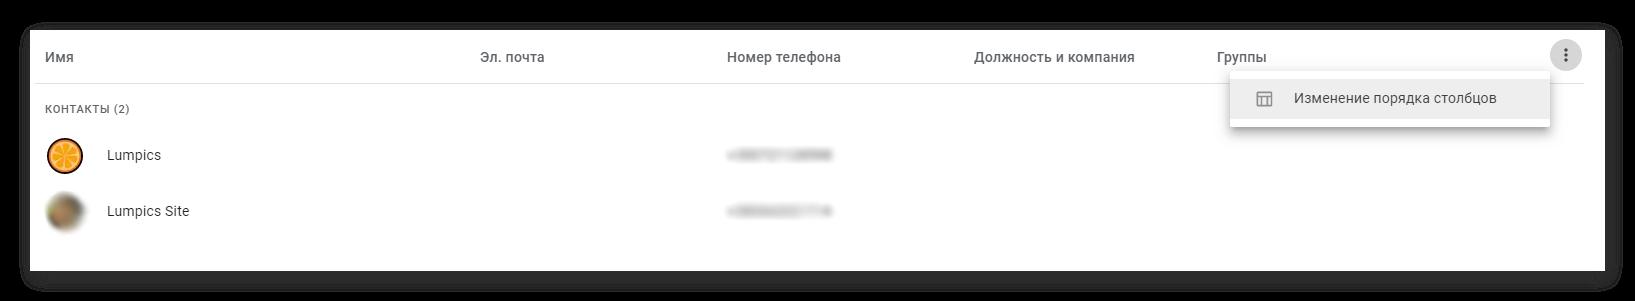 Kategorii-informaczii-o-kontaktah-v-brauzere-Google-Chrome.png